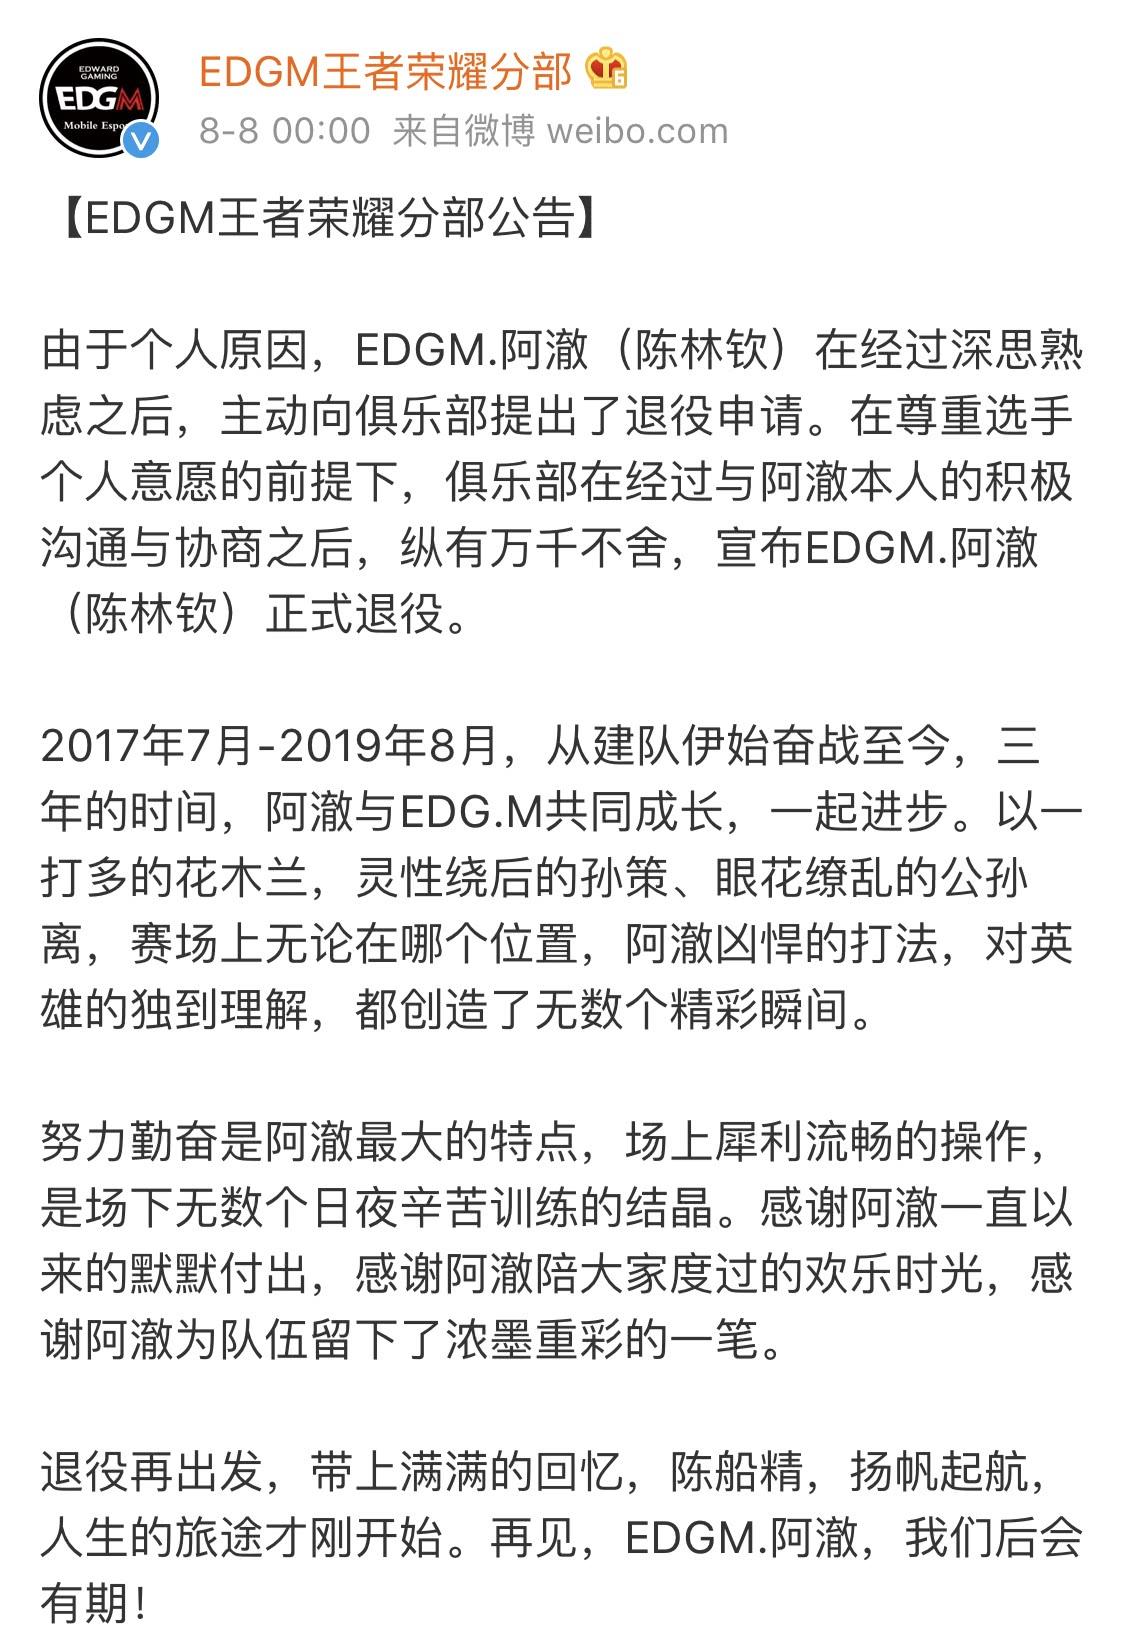 KPL:转会期还未到,退役先来,EDG.M阿澈宣布退役